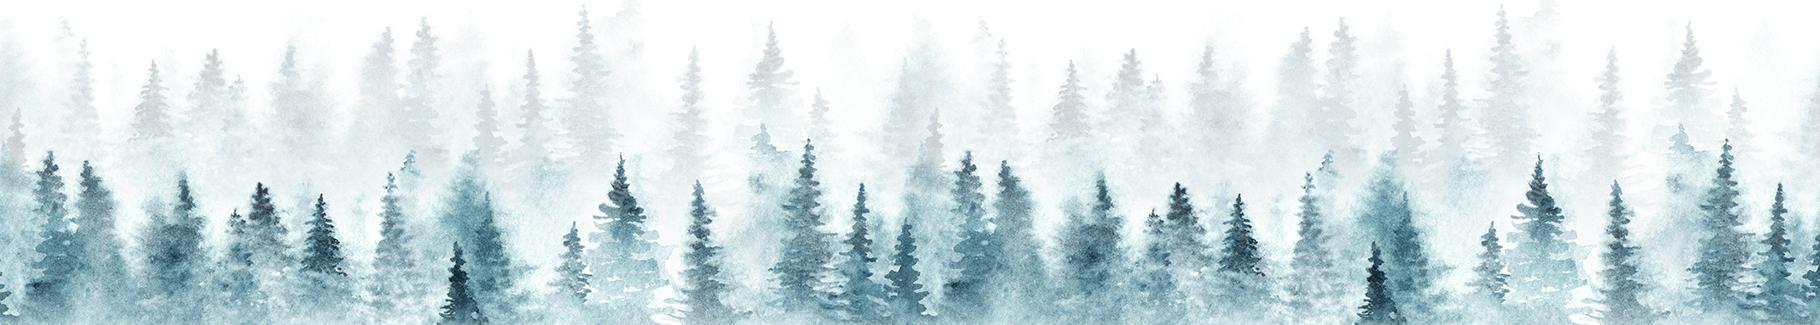 Tapeta zimowy las